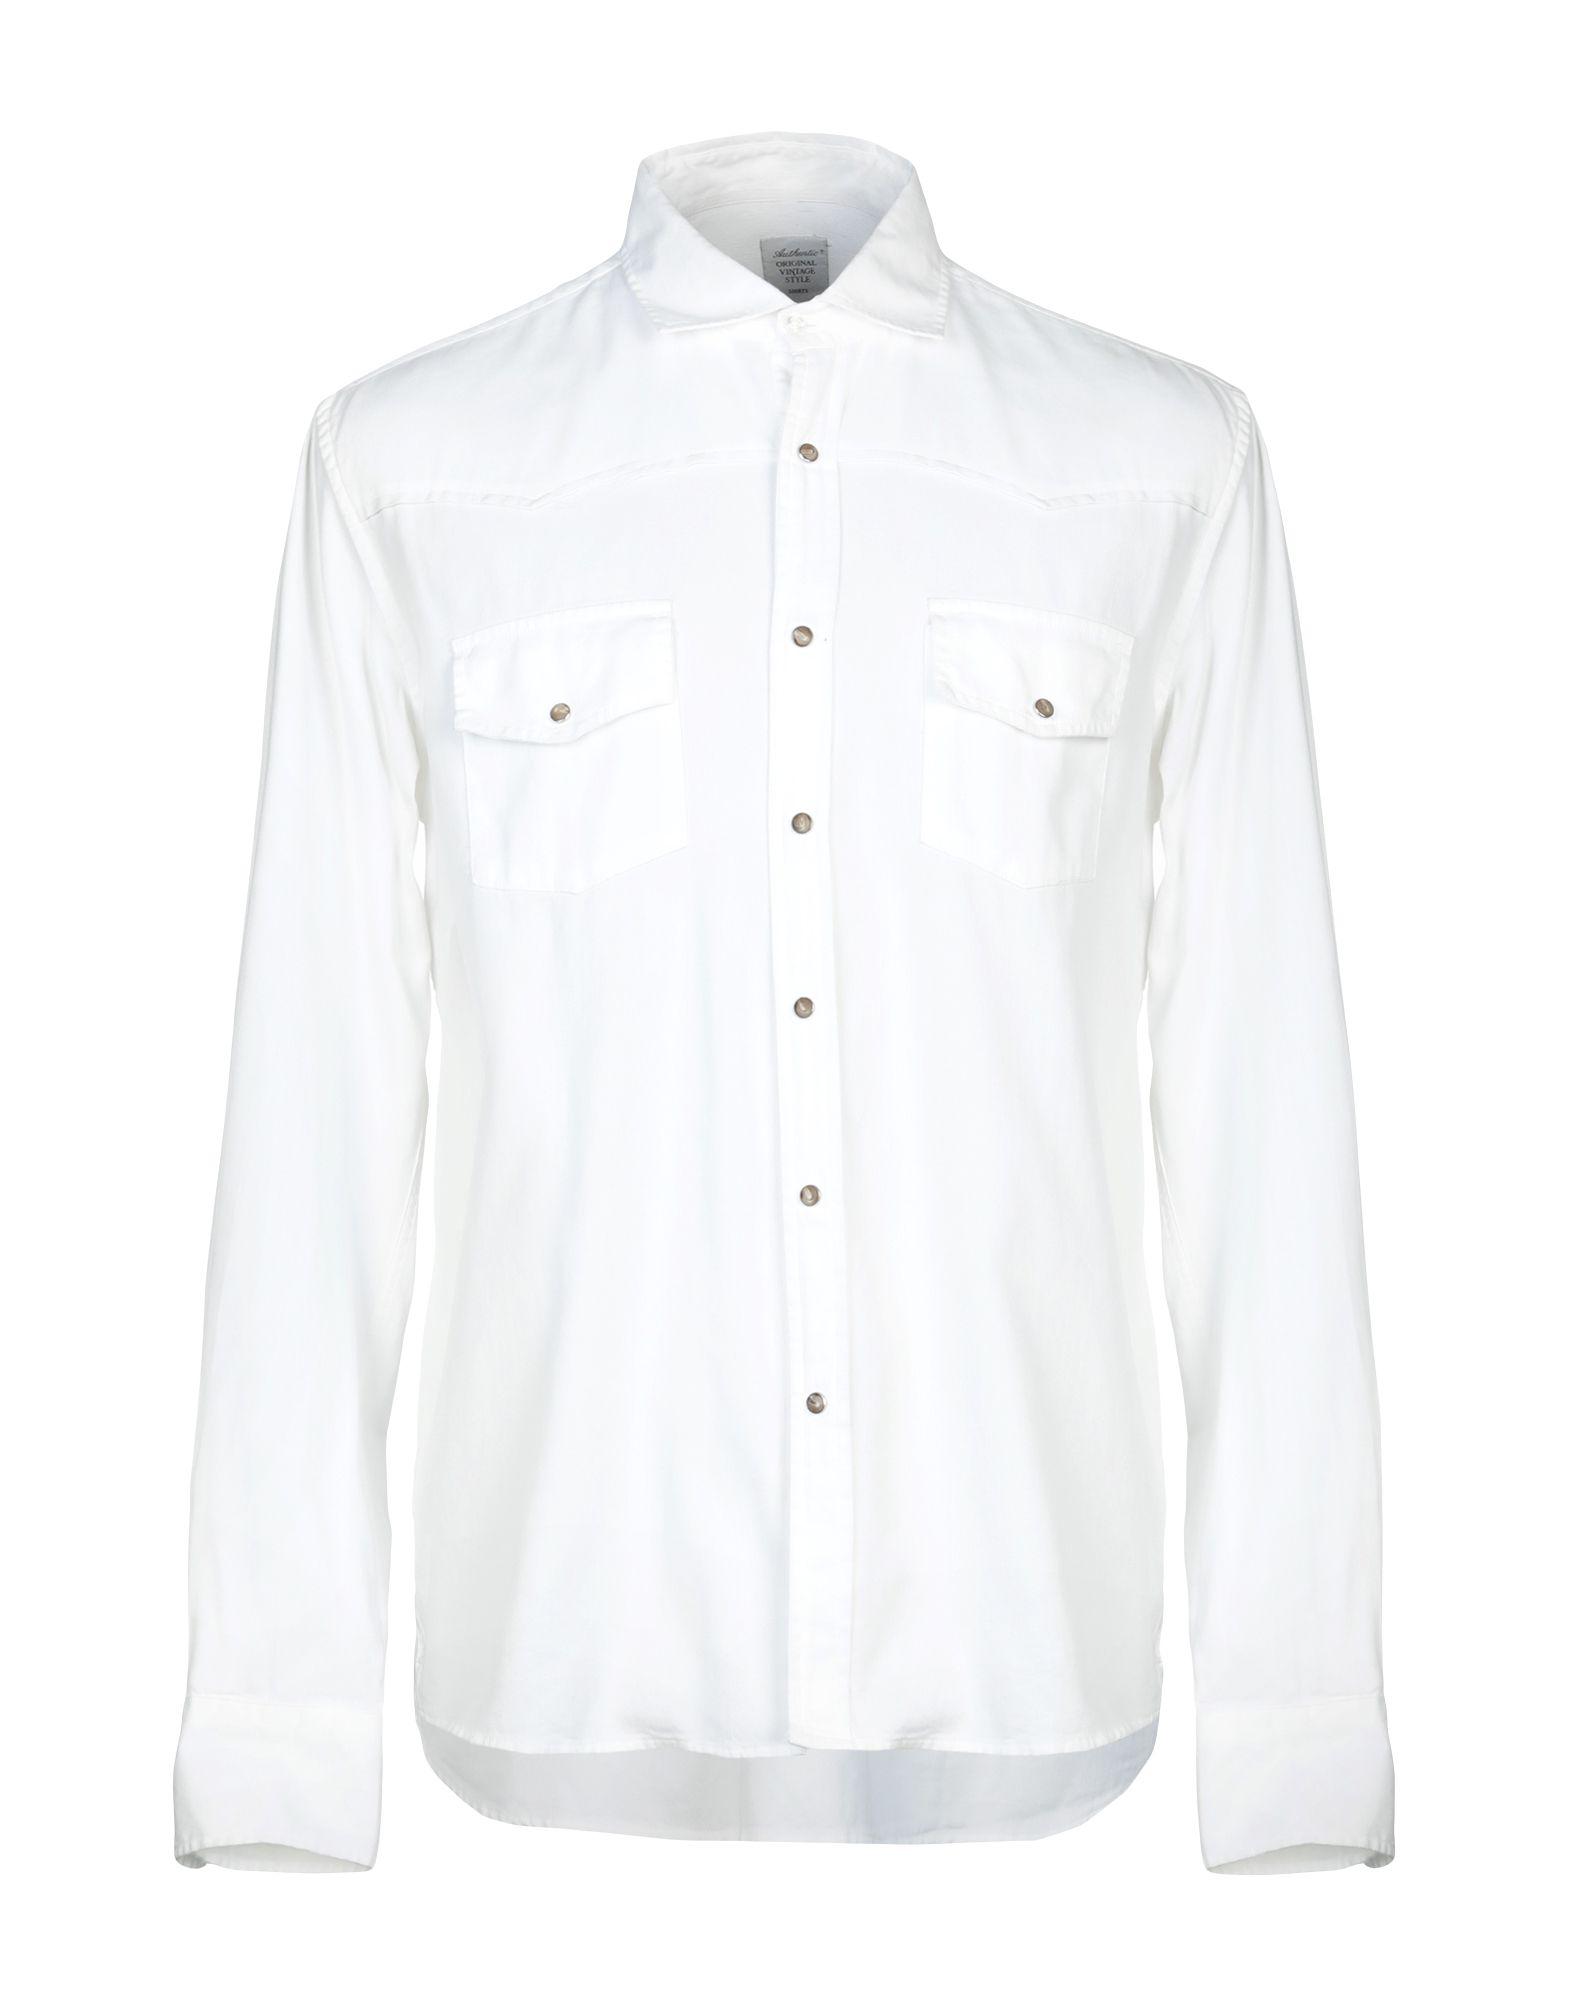 AUTHENTIC ORIGINAL VINTAGE STYLE Pубашка authentic original vintage style pубашка